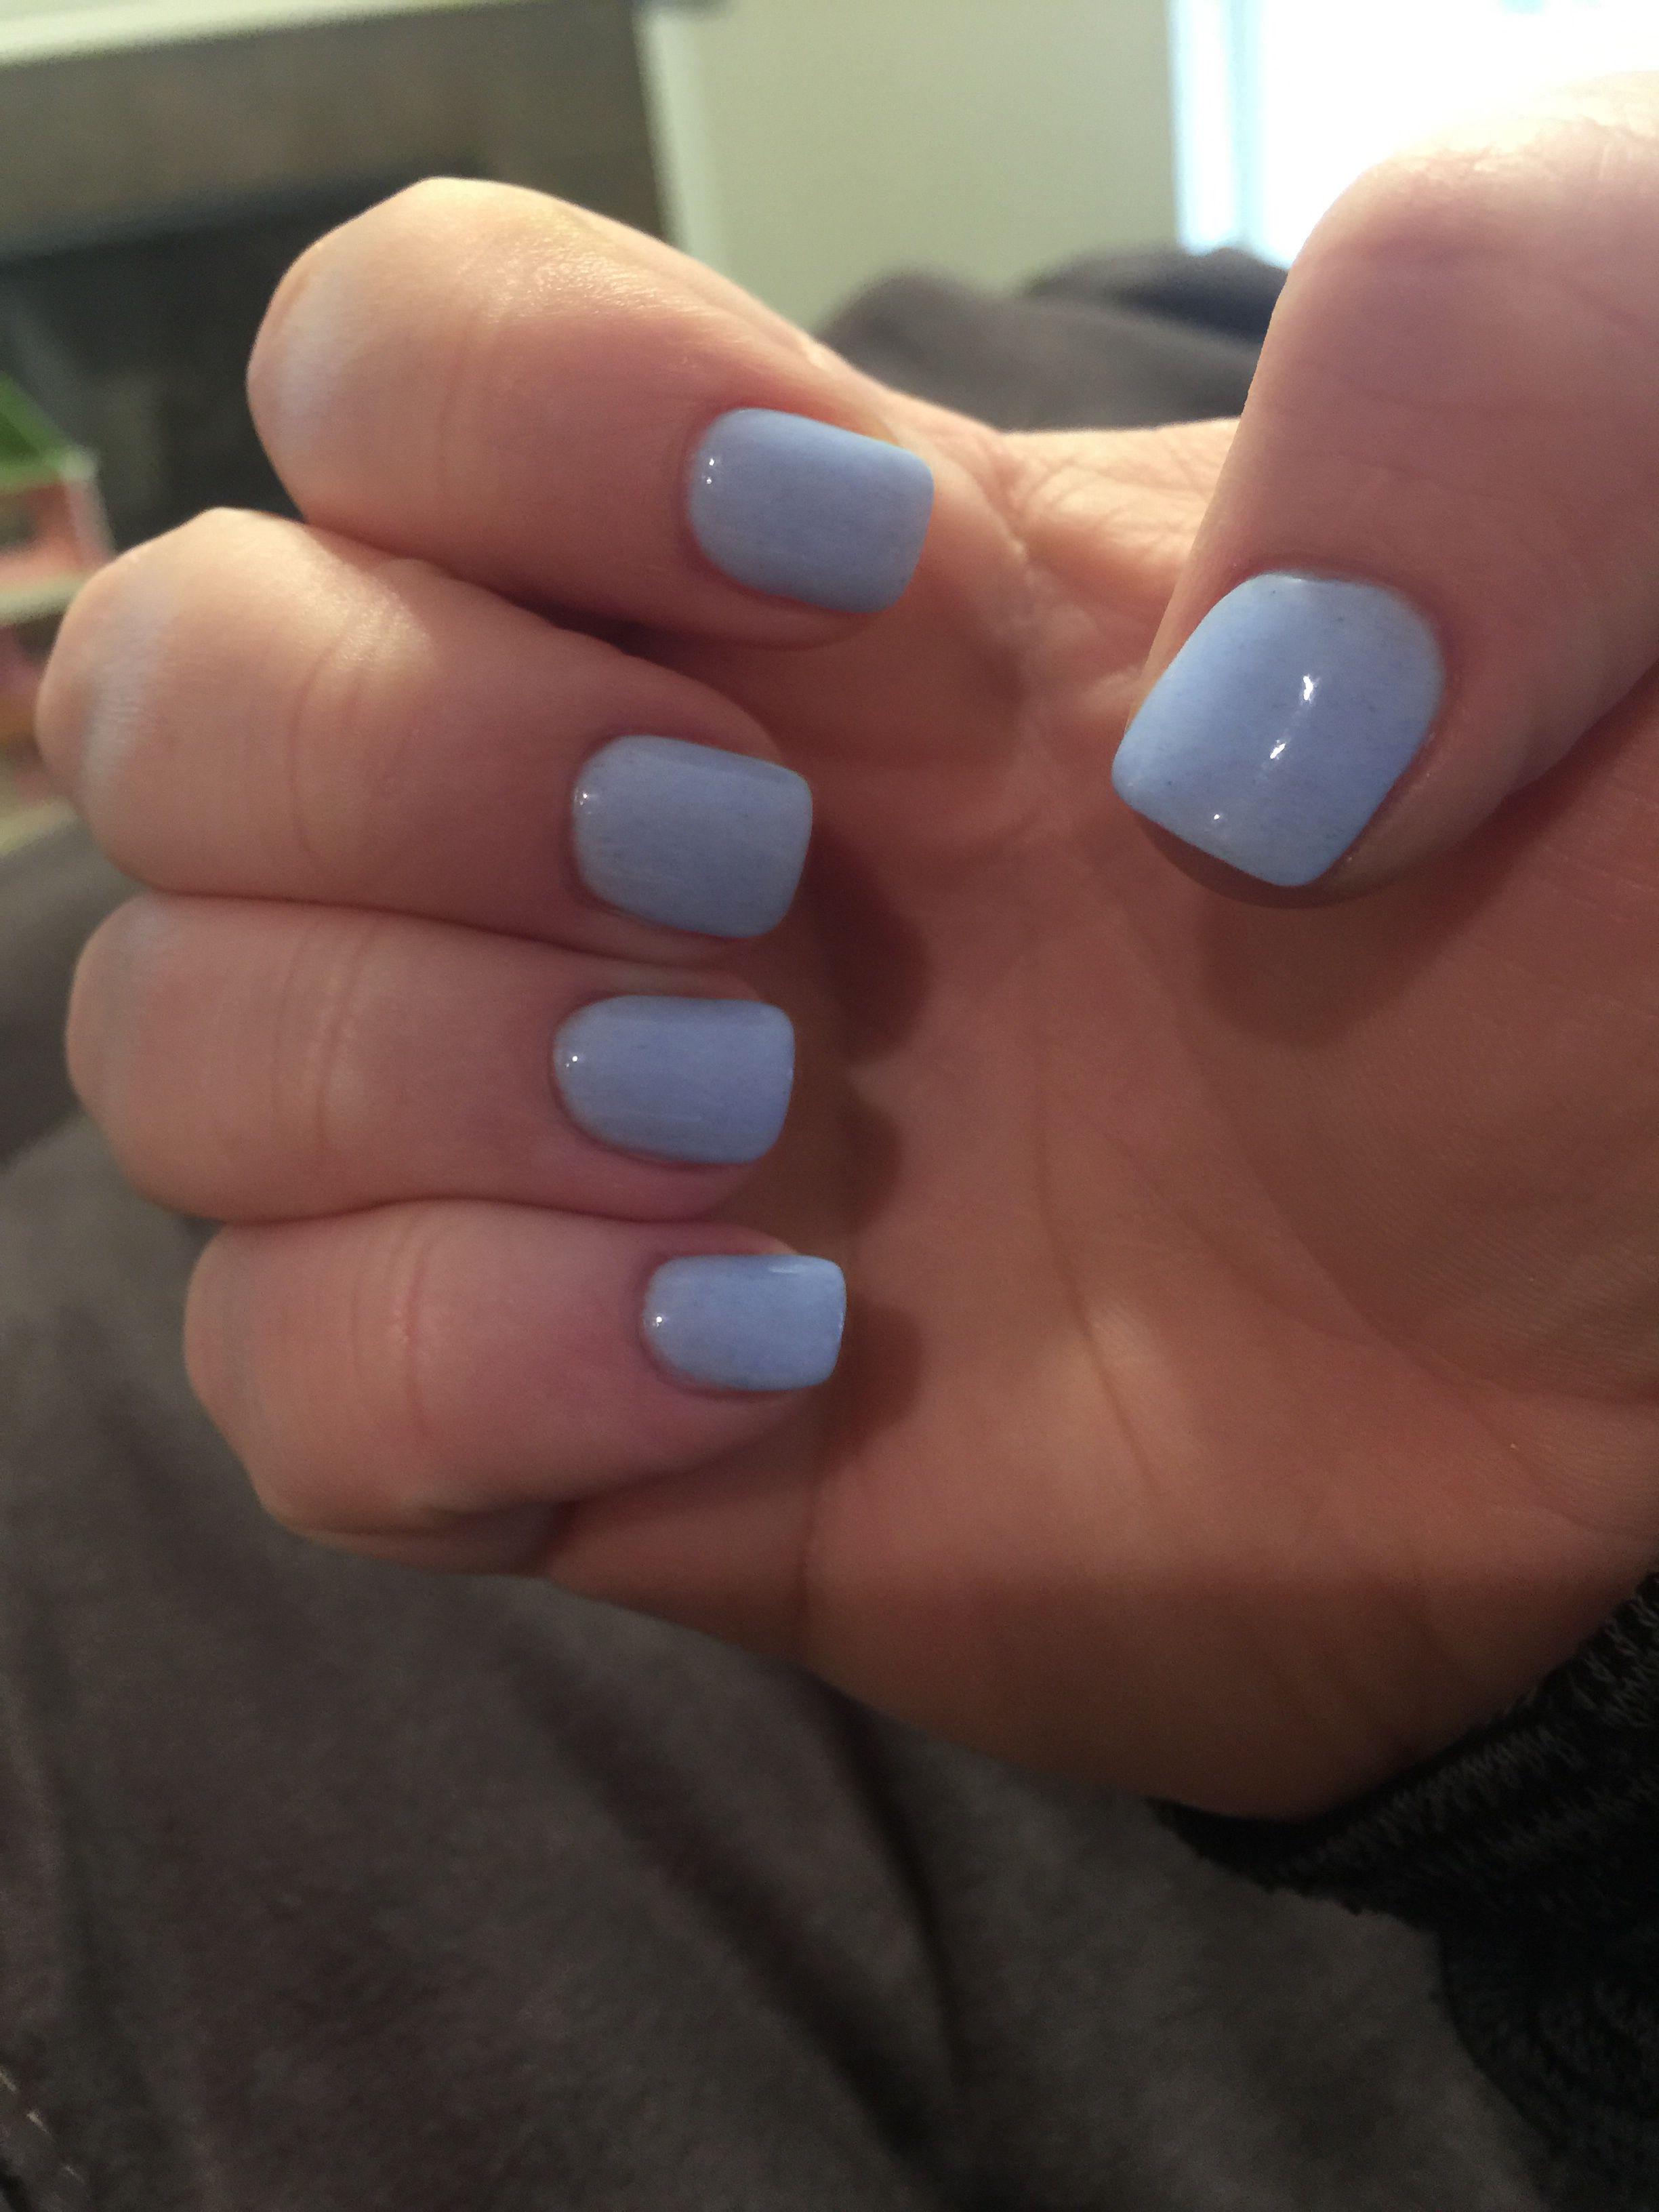 Next generation nails | Nails | Pinterest